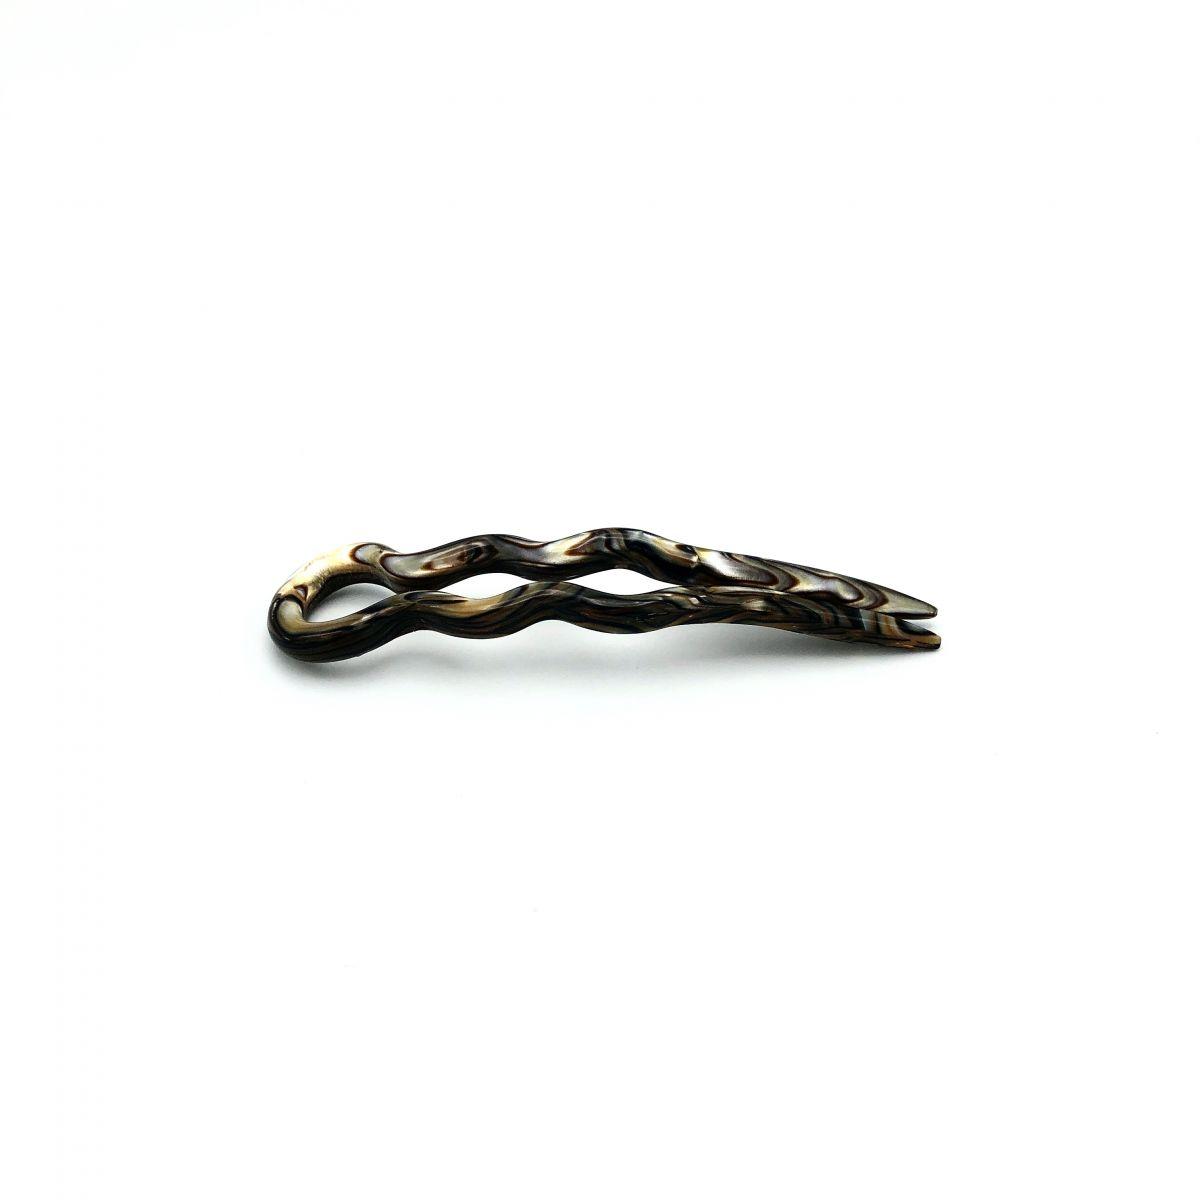 Haarnadel perlmutt/braun - 8,5 cm